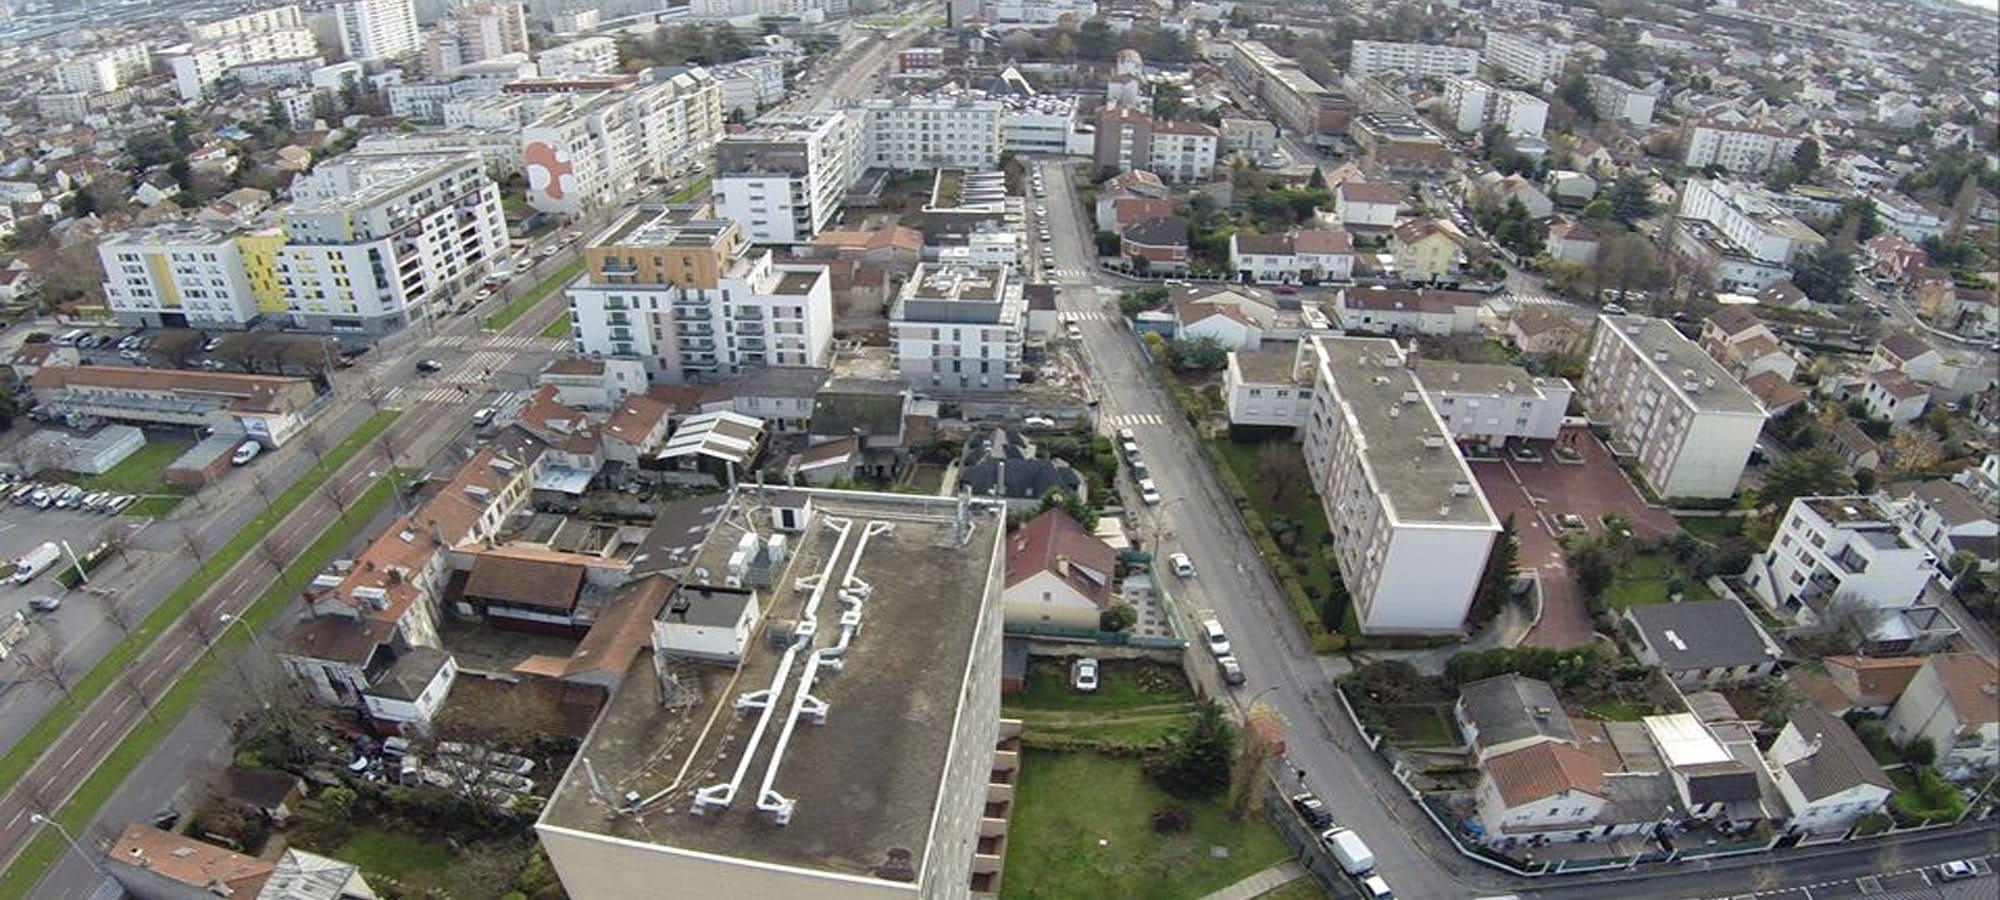 fenetres-Vitry-sur-Seine